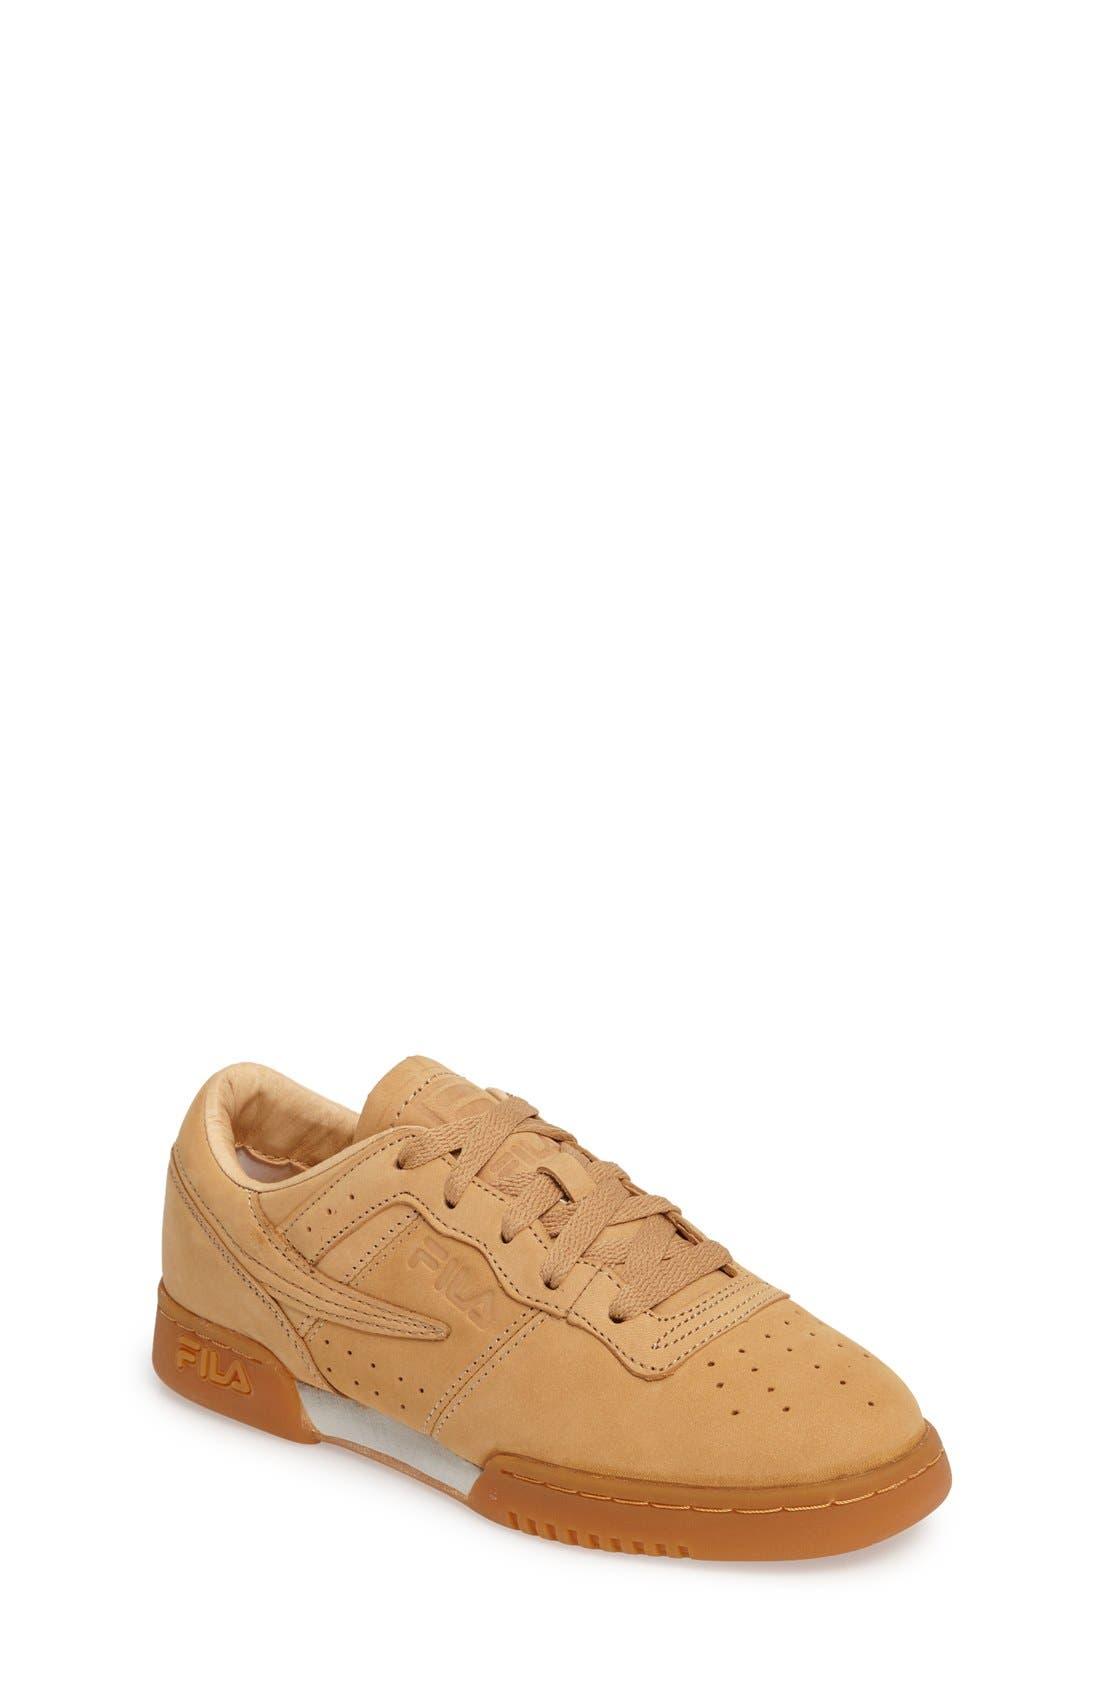 USA Heritage Sneaker,                             Main thumbnail 1, color,